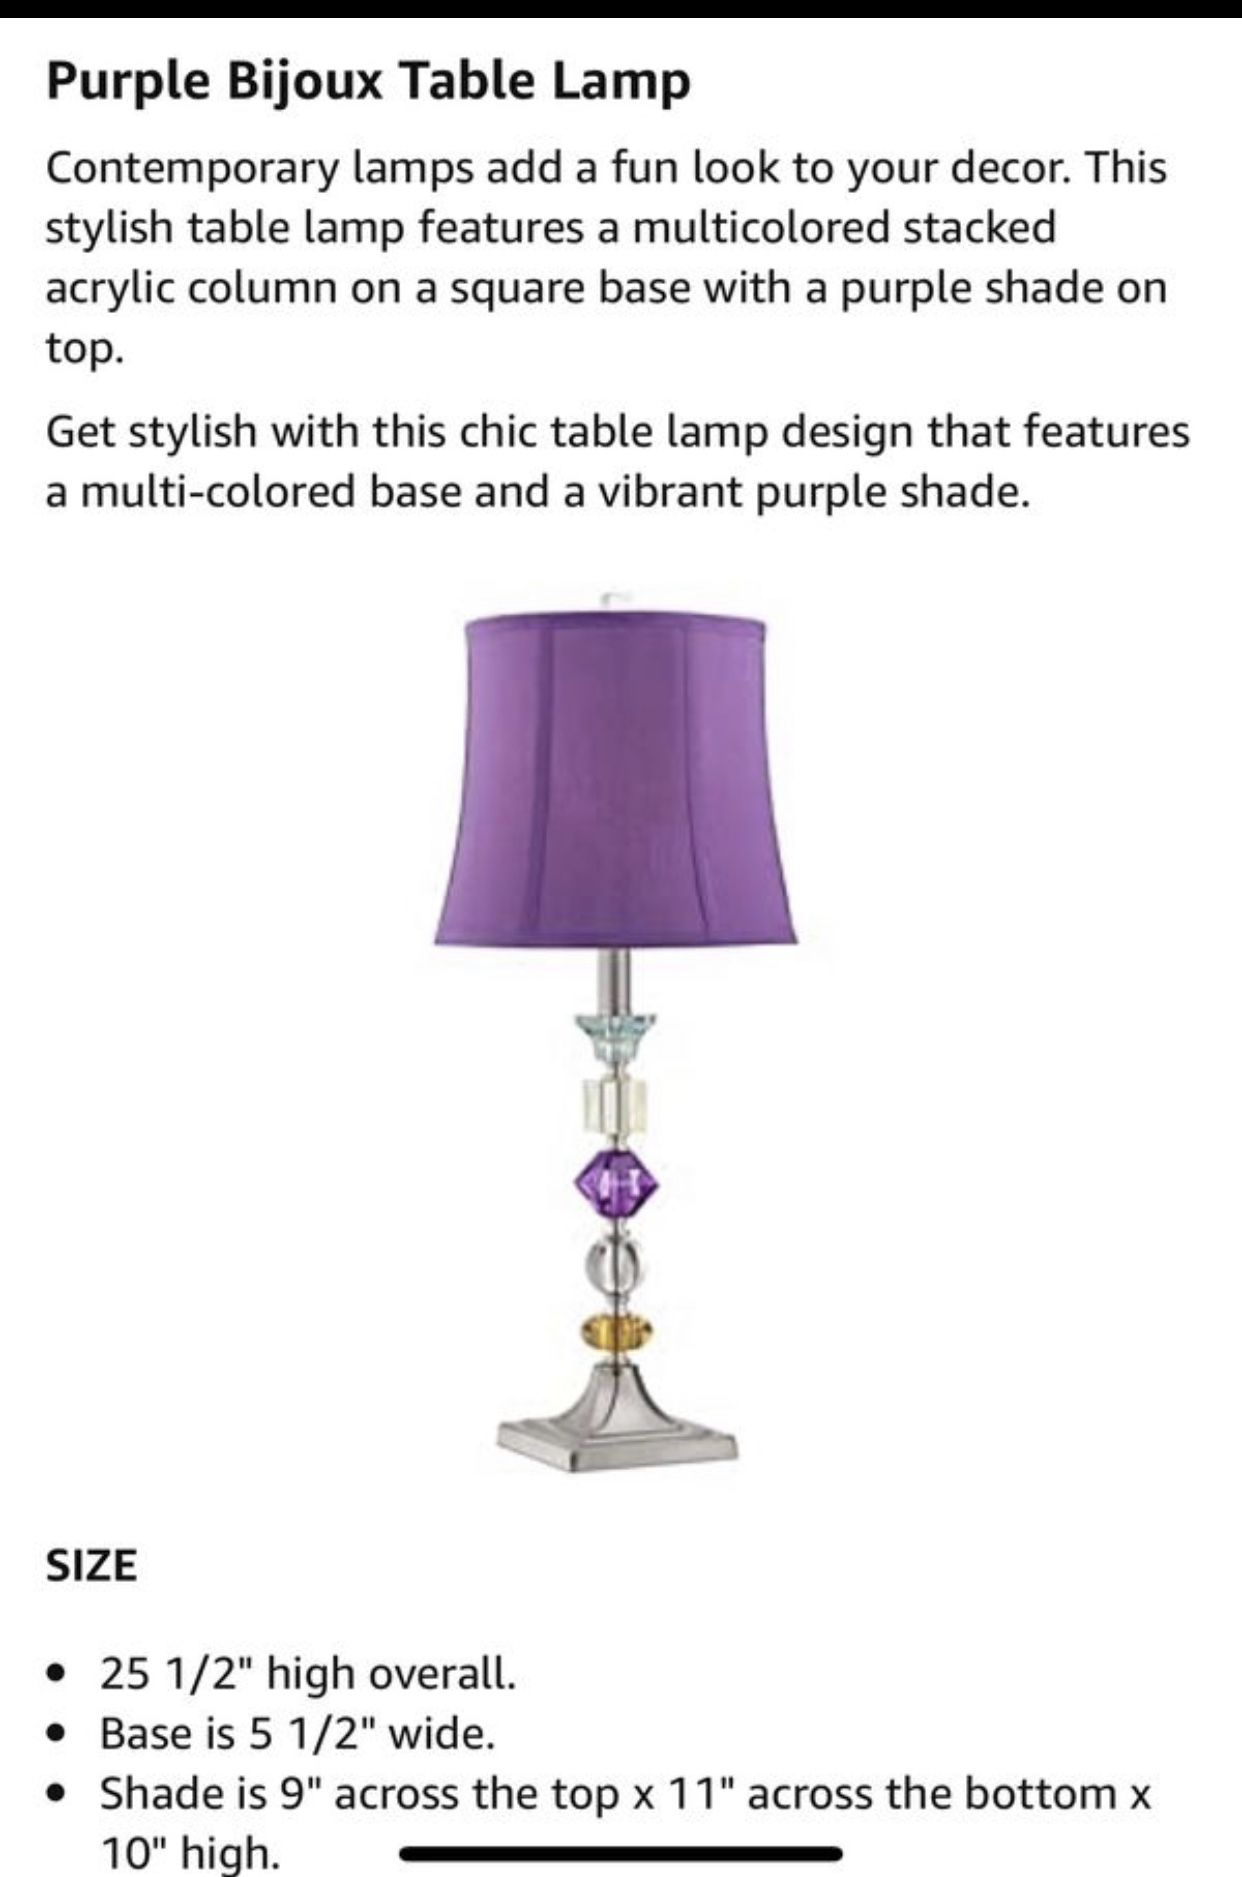 Beautiful Set of lamps